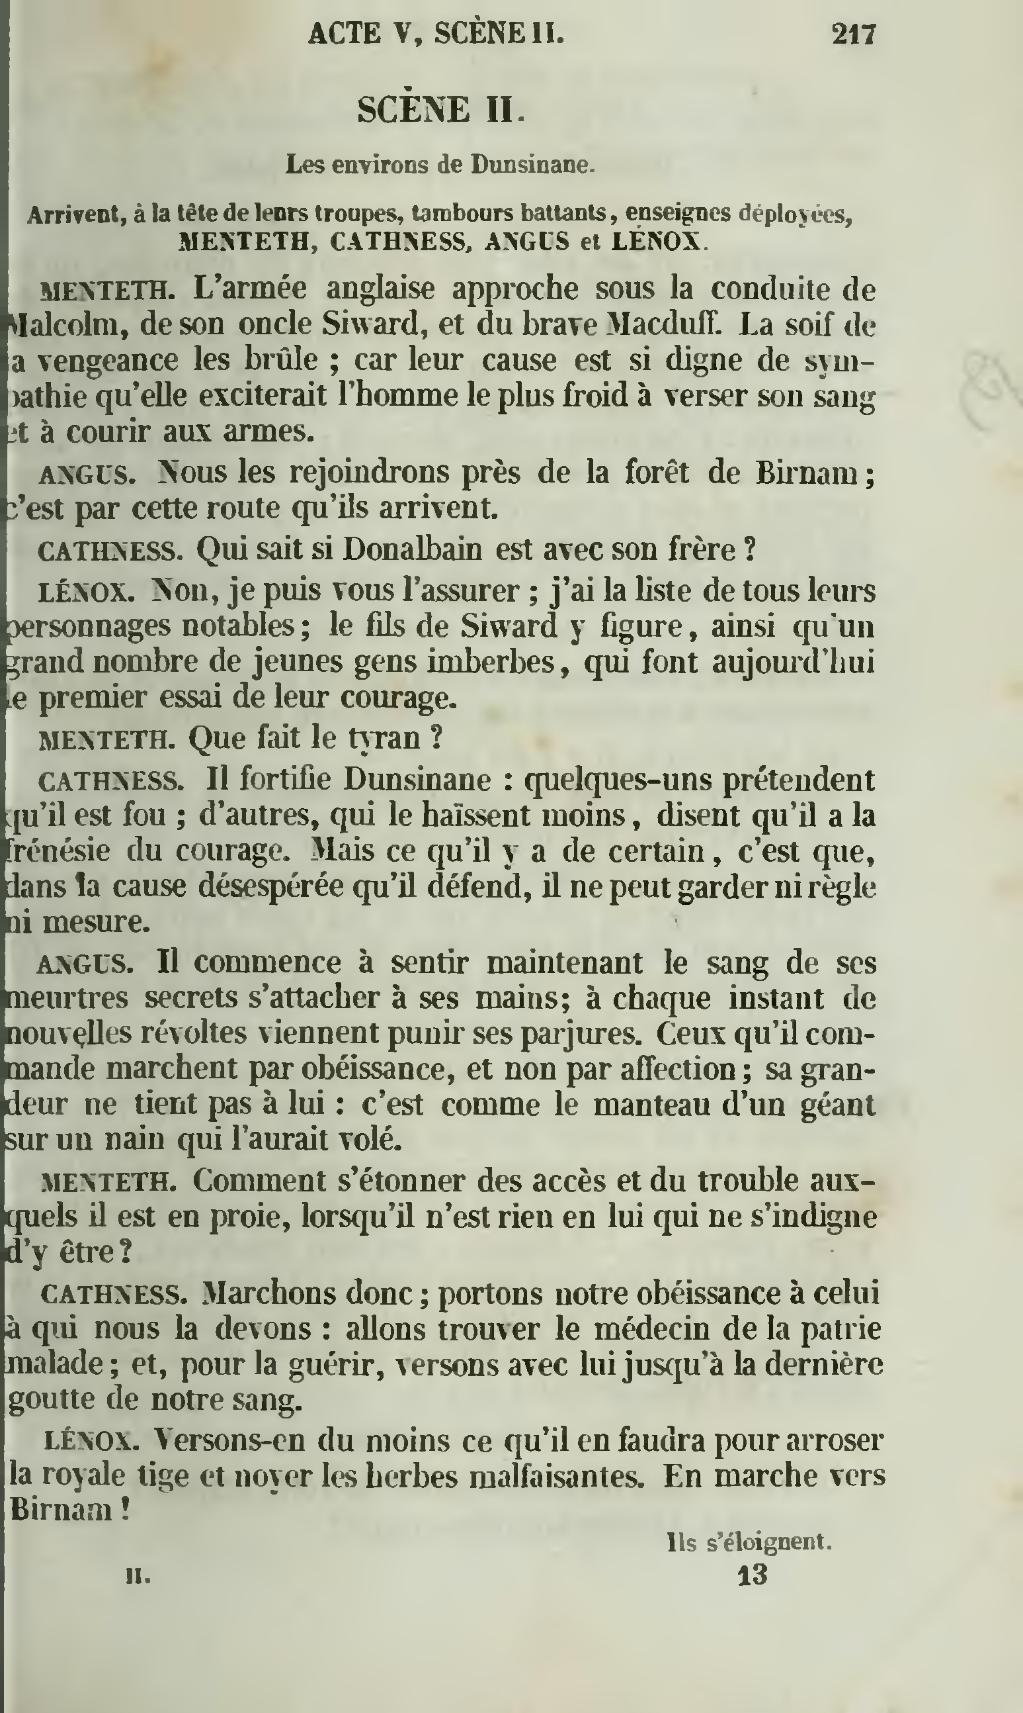 page shakespeare -  u0152uvres compl u00e8tes  laroche  1842  vol 2 djvu  227